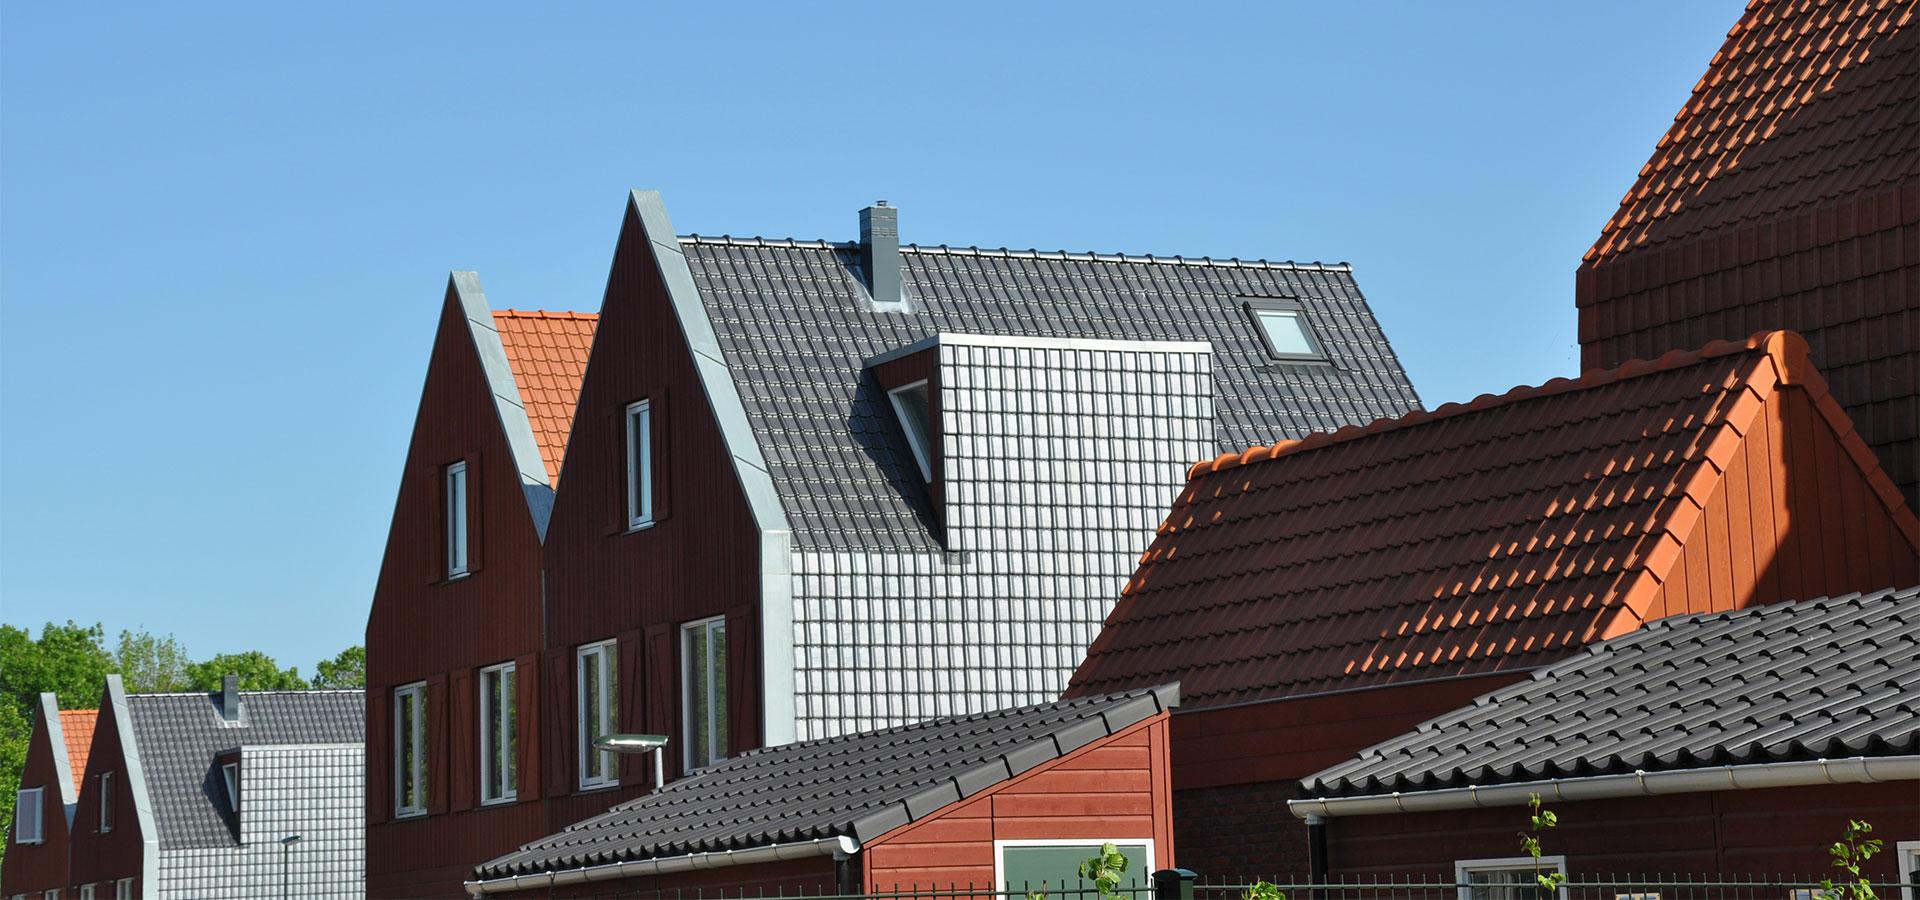 FARO architecten Twuyverhoek Sint Pancras 03